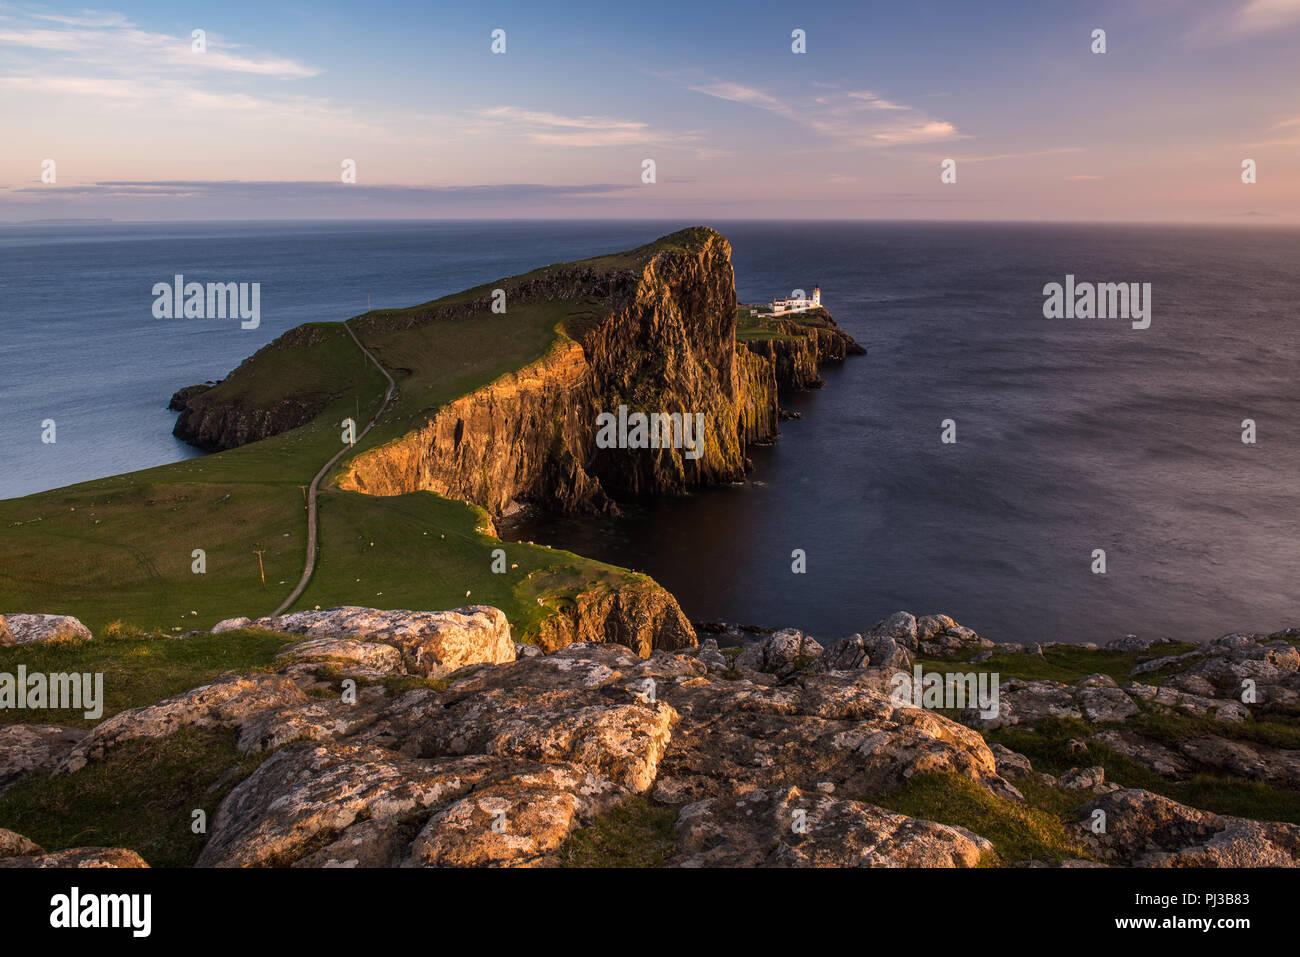 The lighthouse built by David Stevenson at Neist point on Skye, Scotland - Stock Image